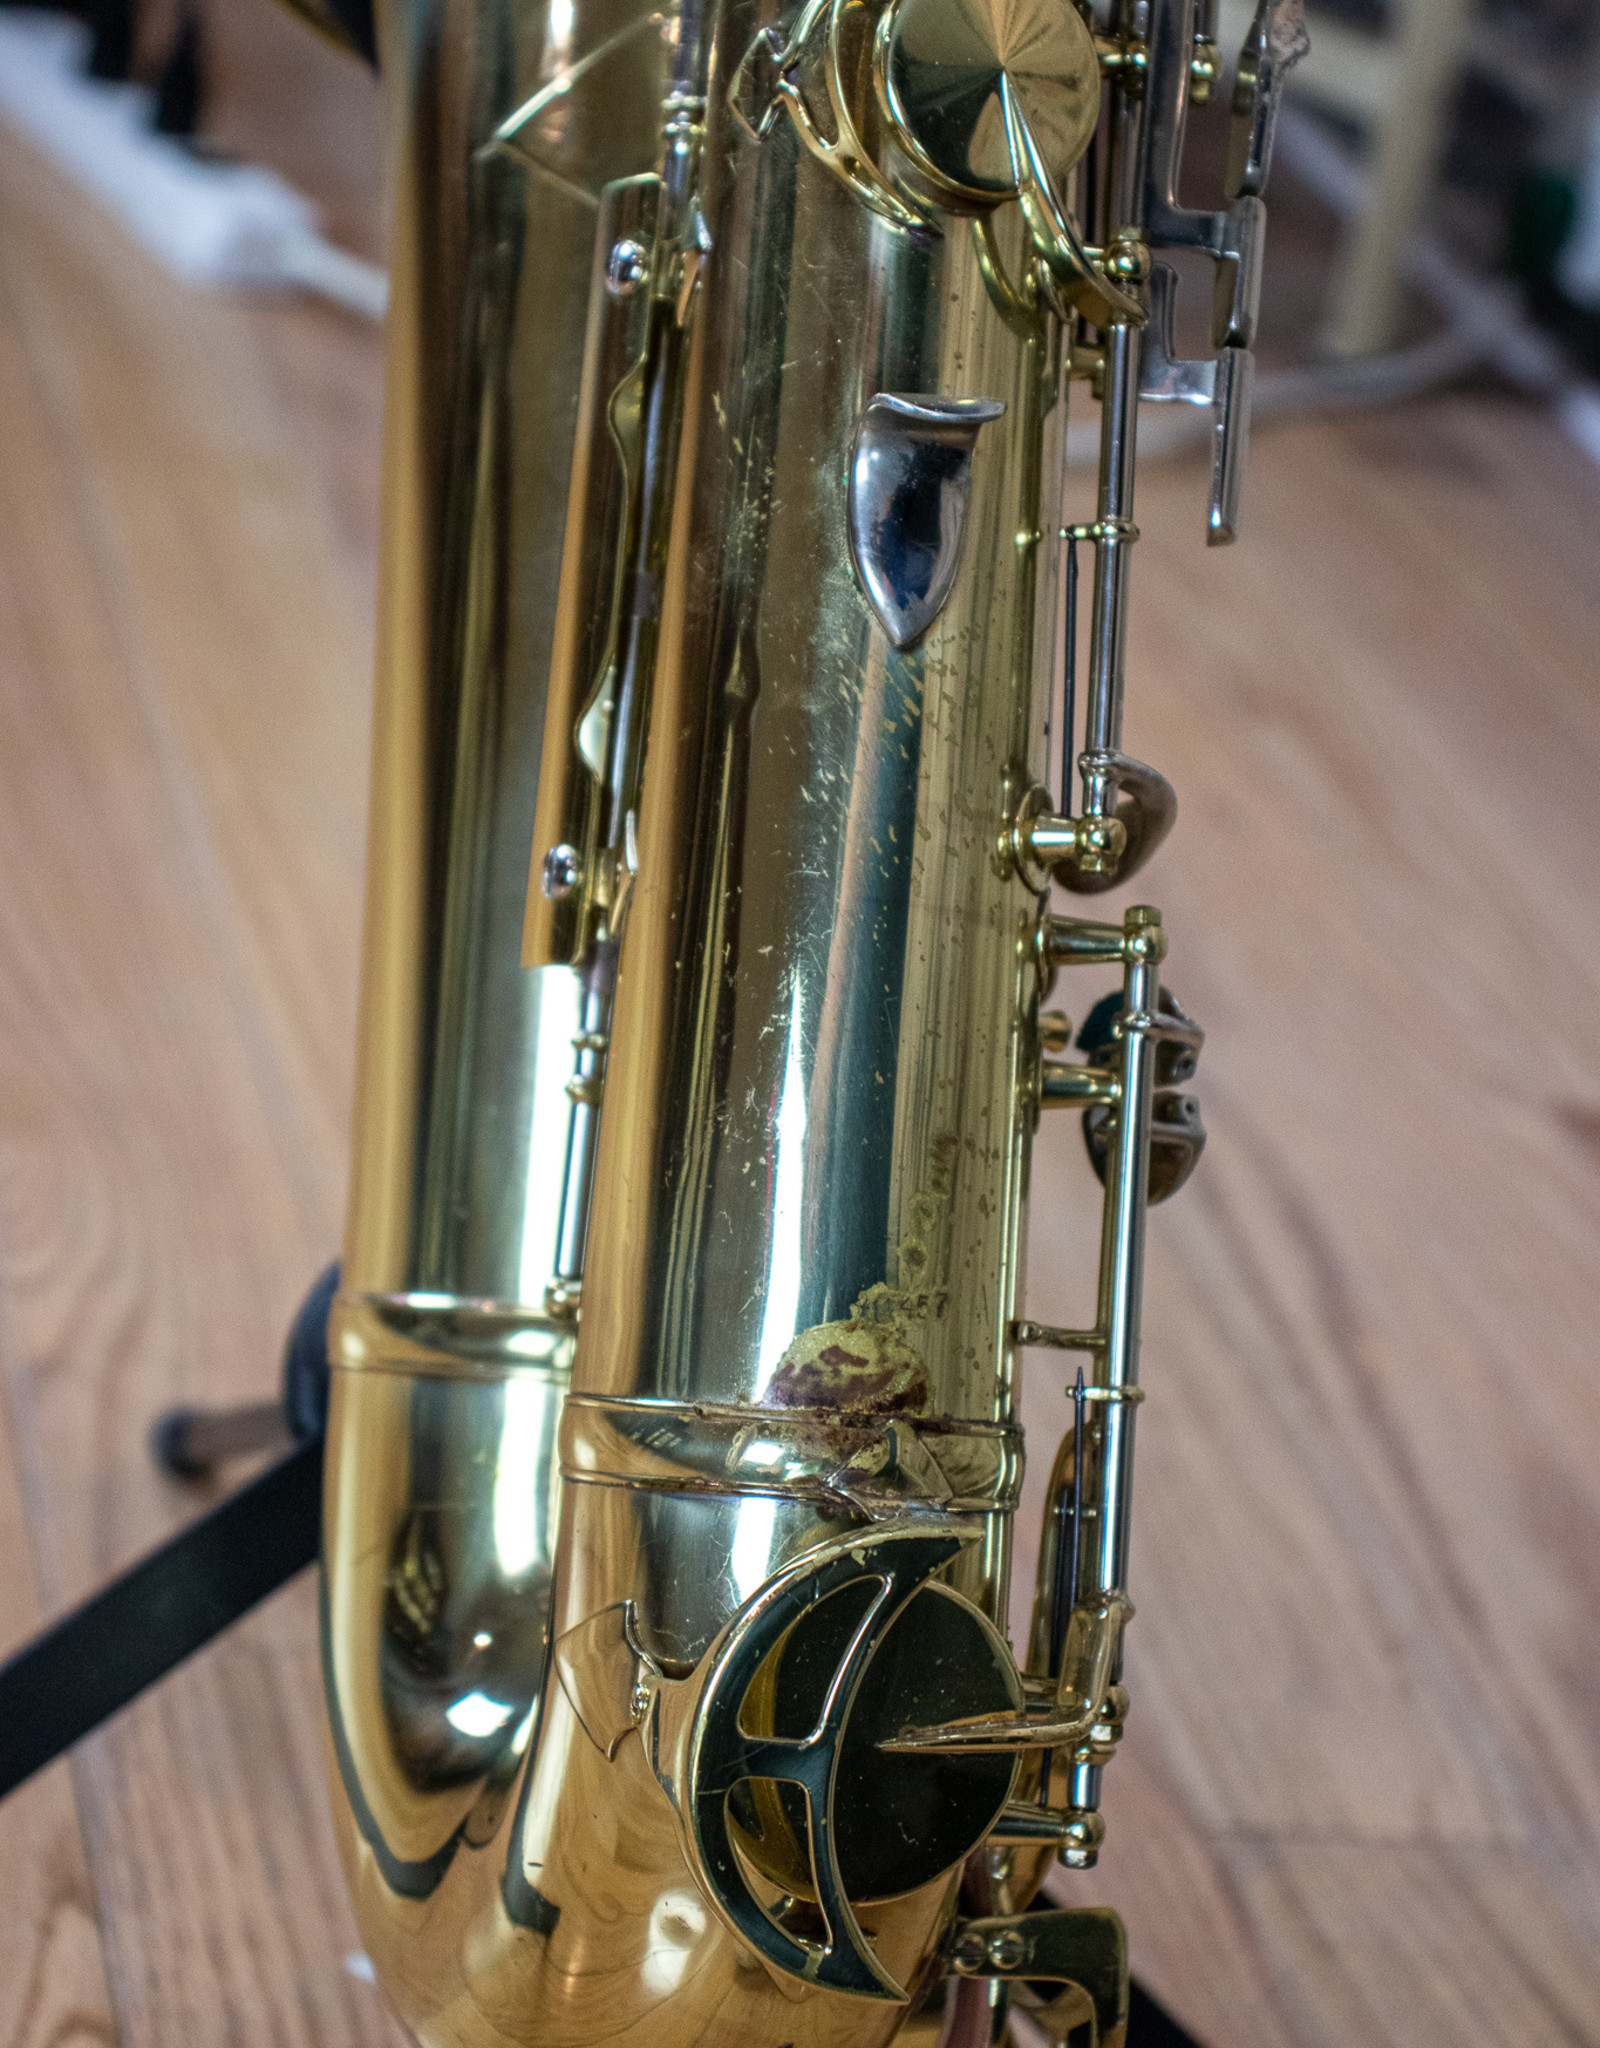 King 1966 King Series IV Super 20 Tenor Saxophone